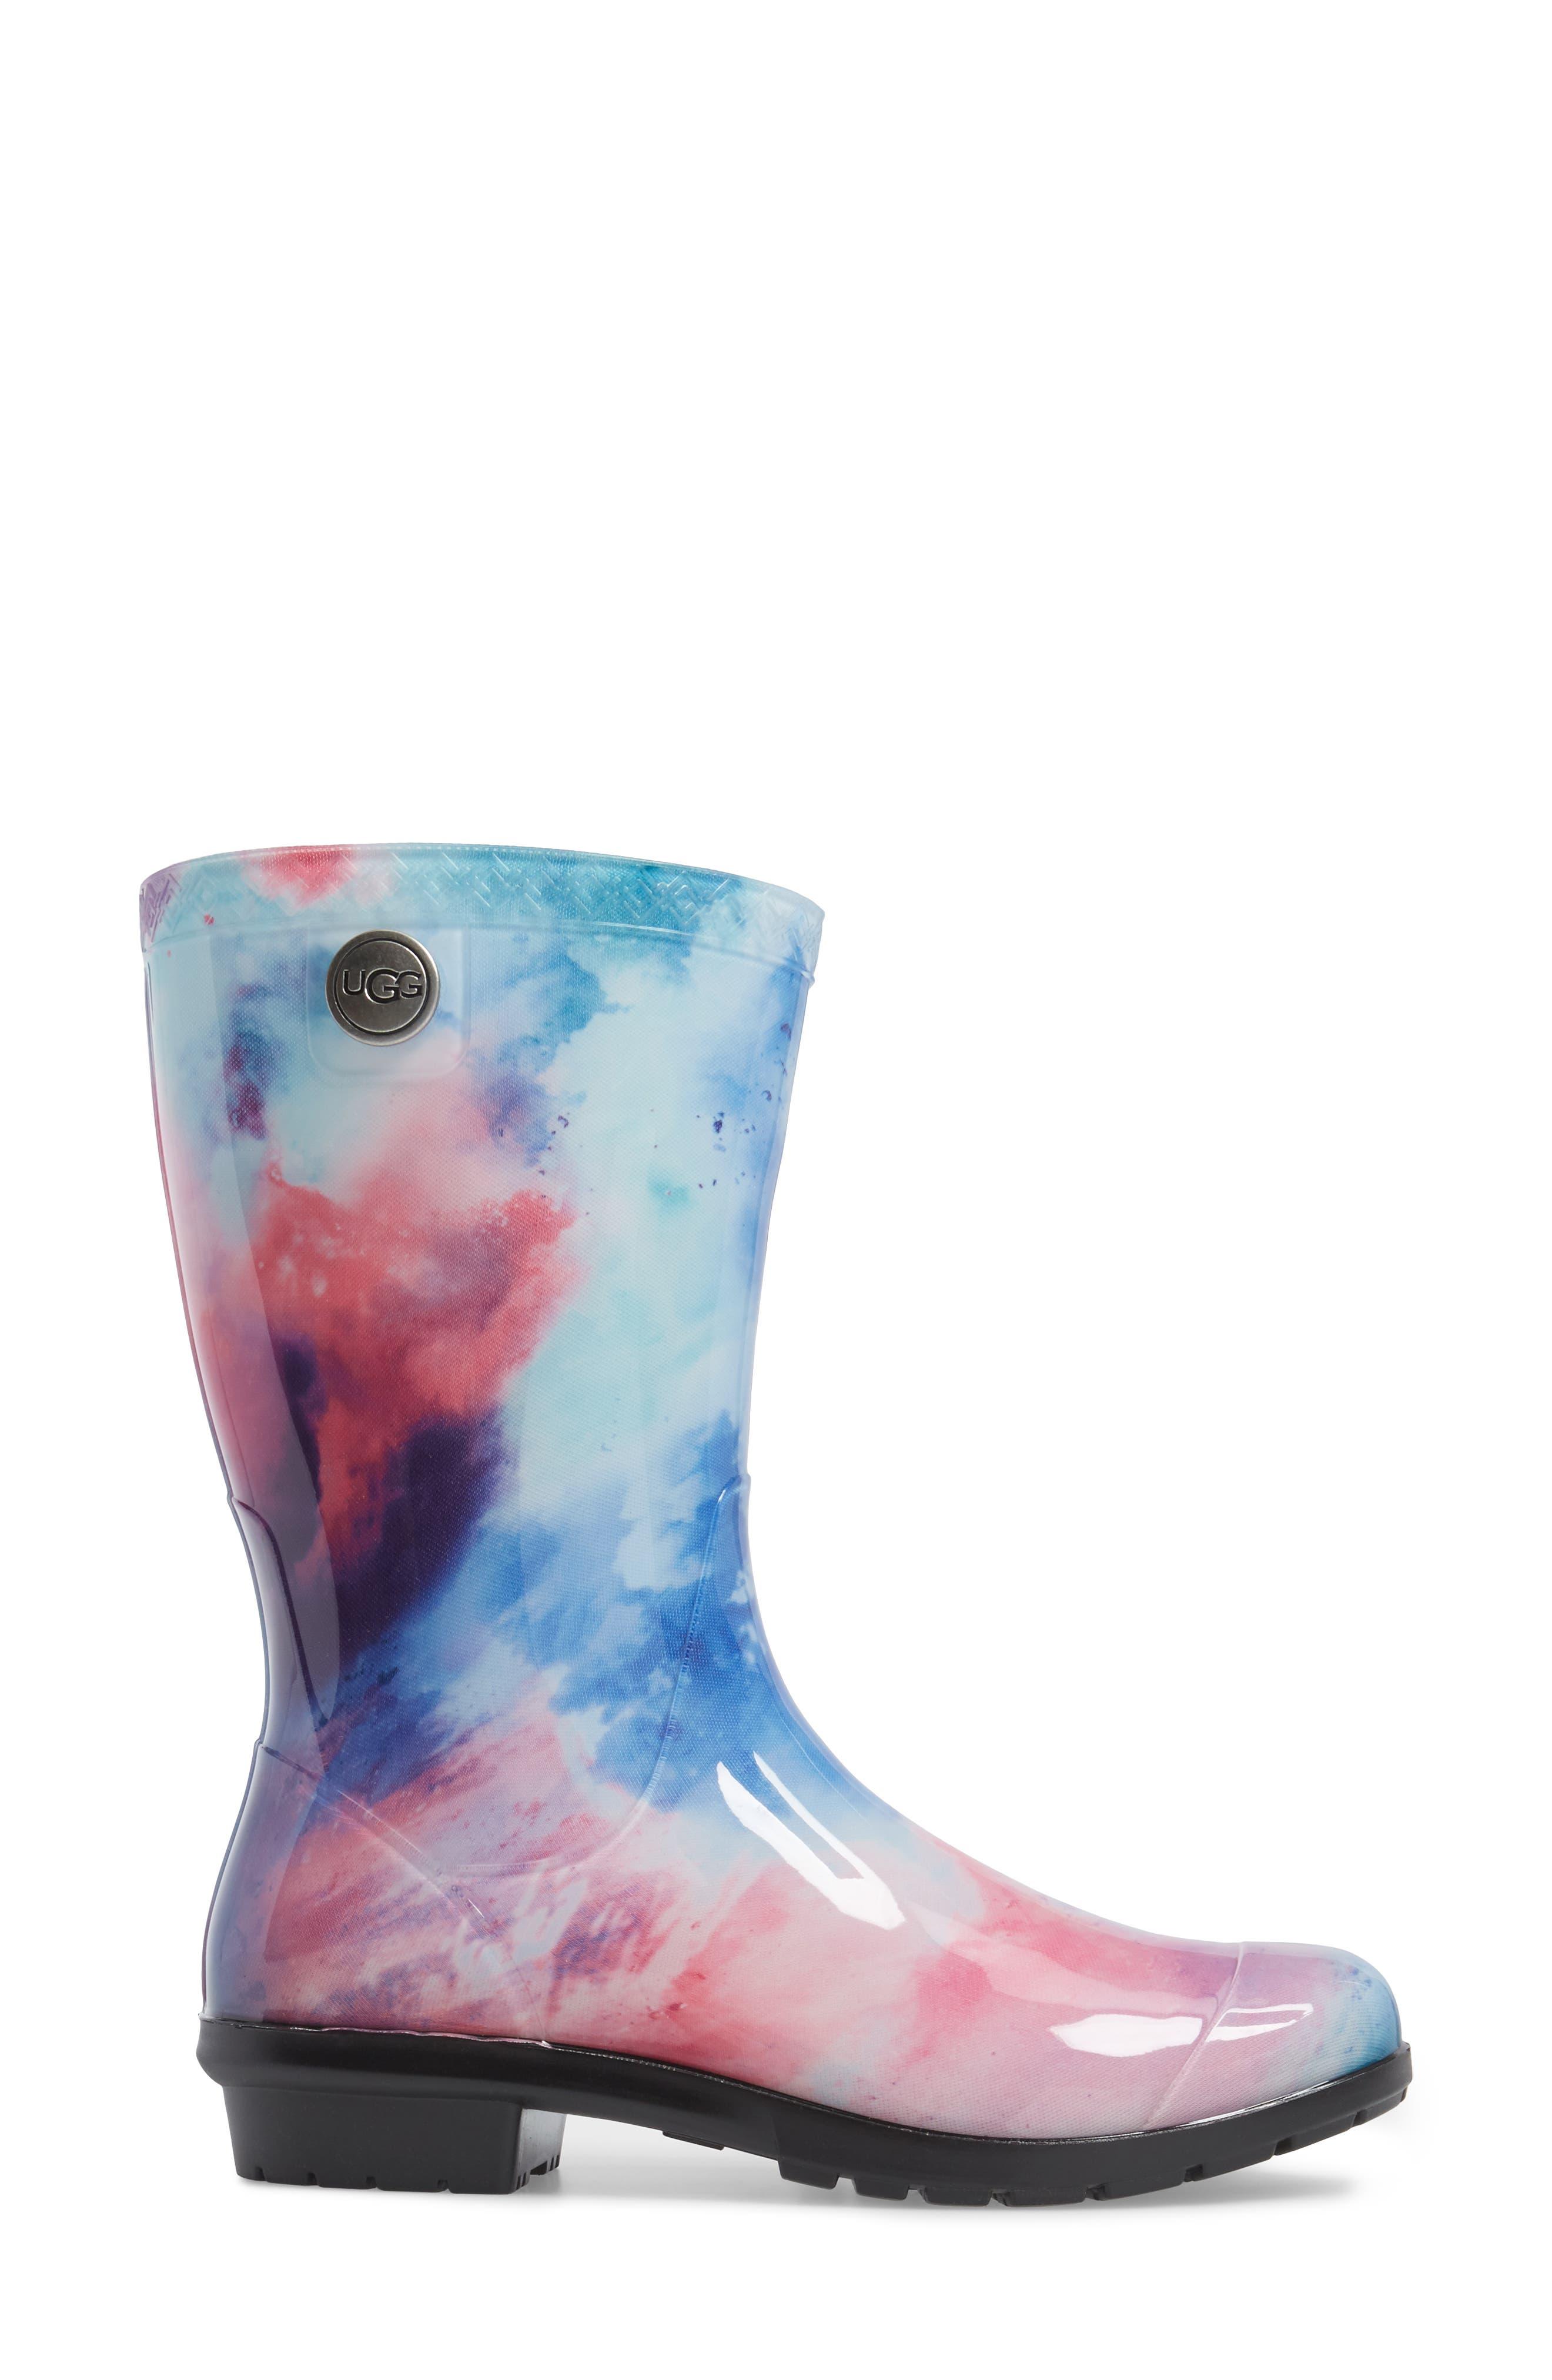 Sienna Watercolor Waterproof Rain Boot,                             Alternate thumbnail 3, color,                             Wild Rose/ Waterfall